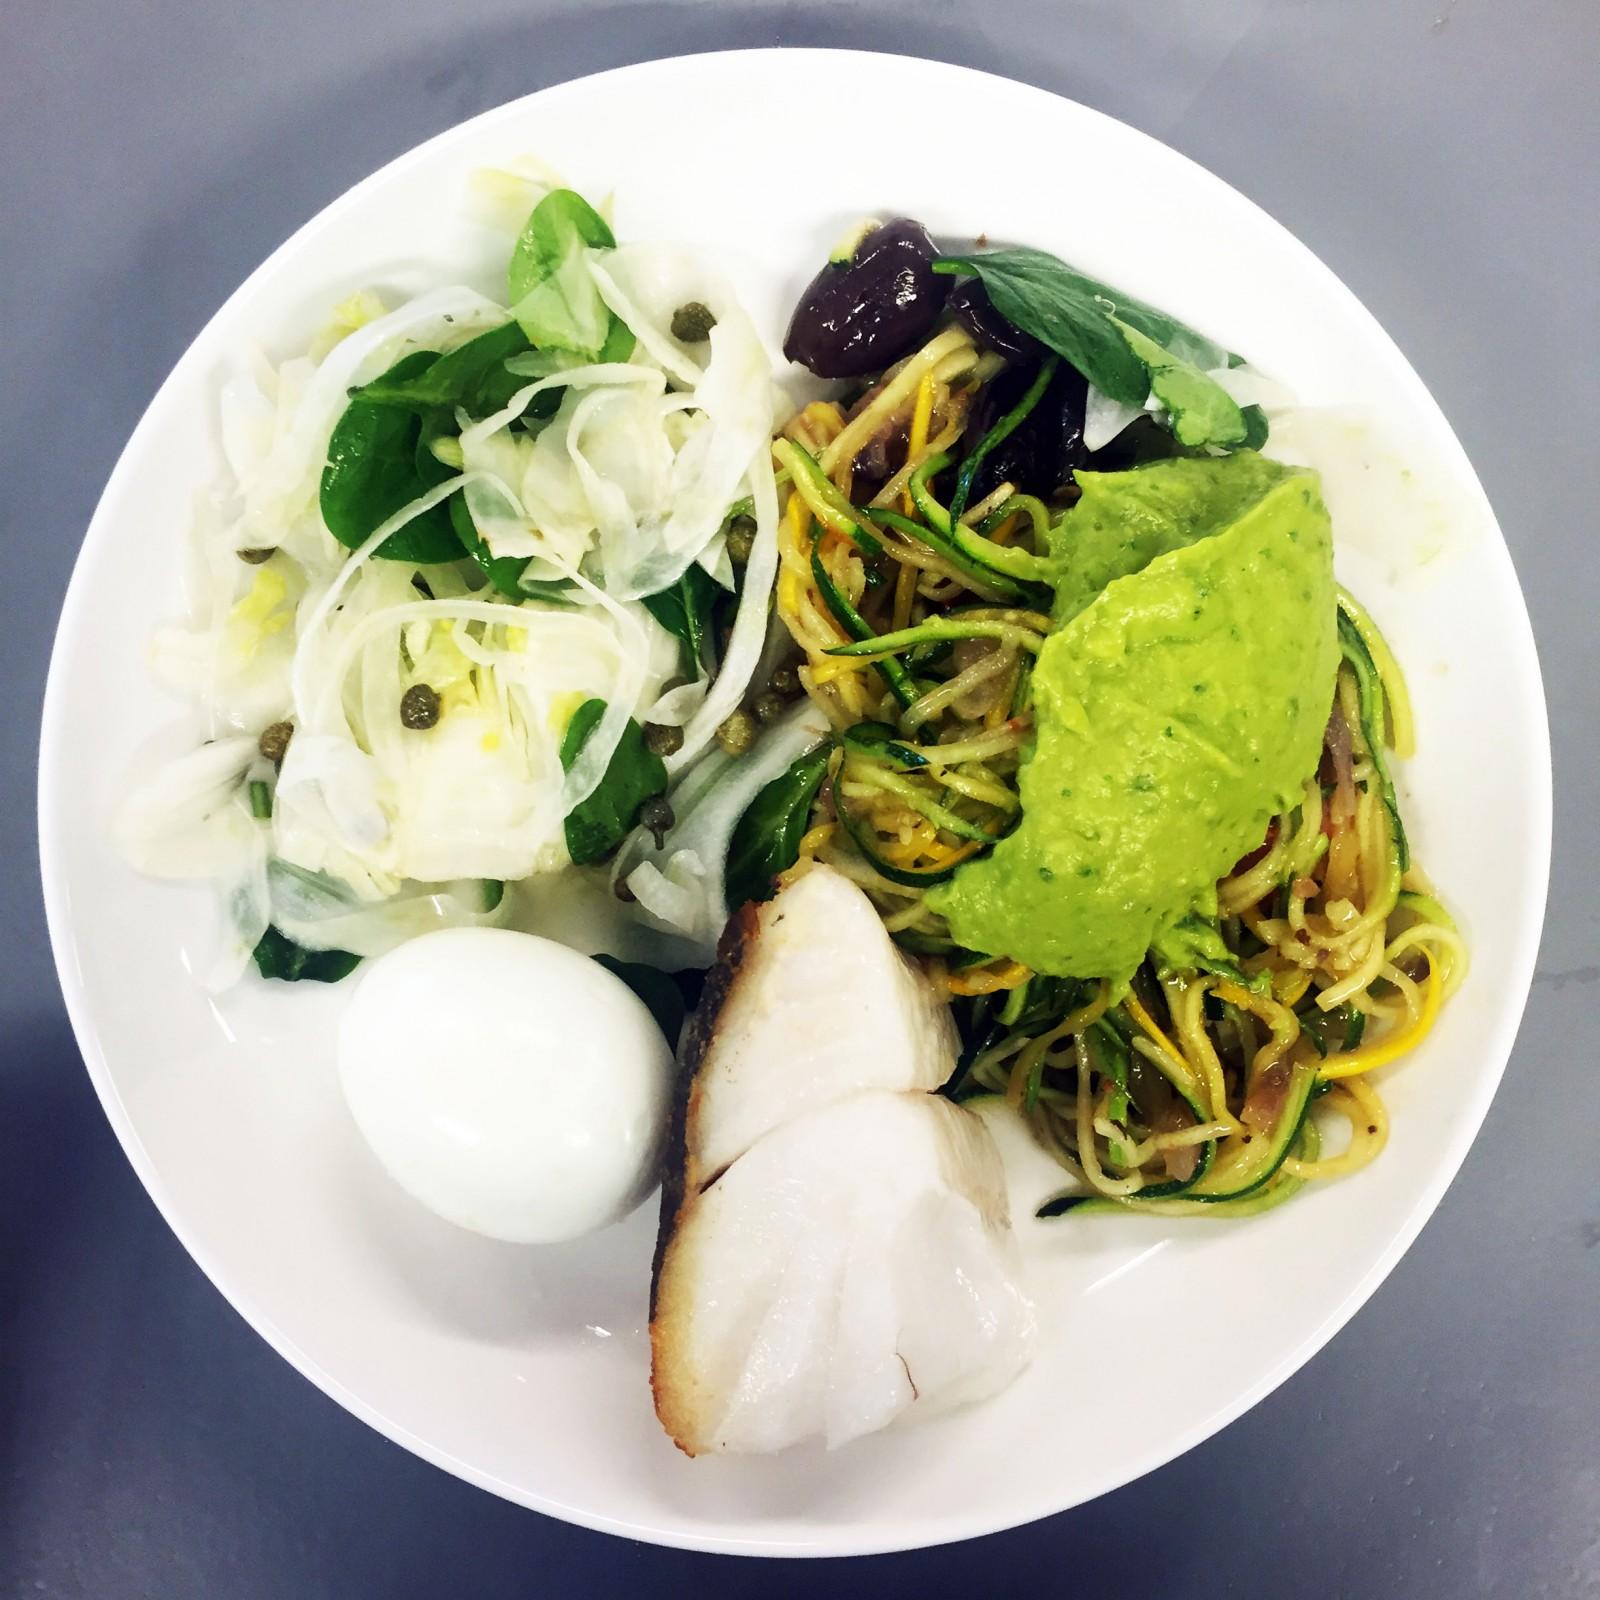 Zucchini with pesto